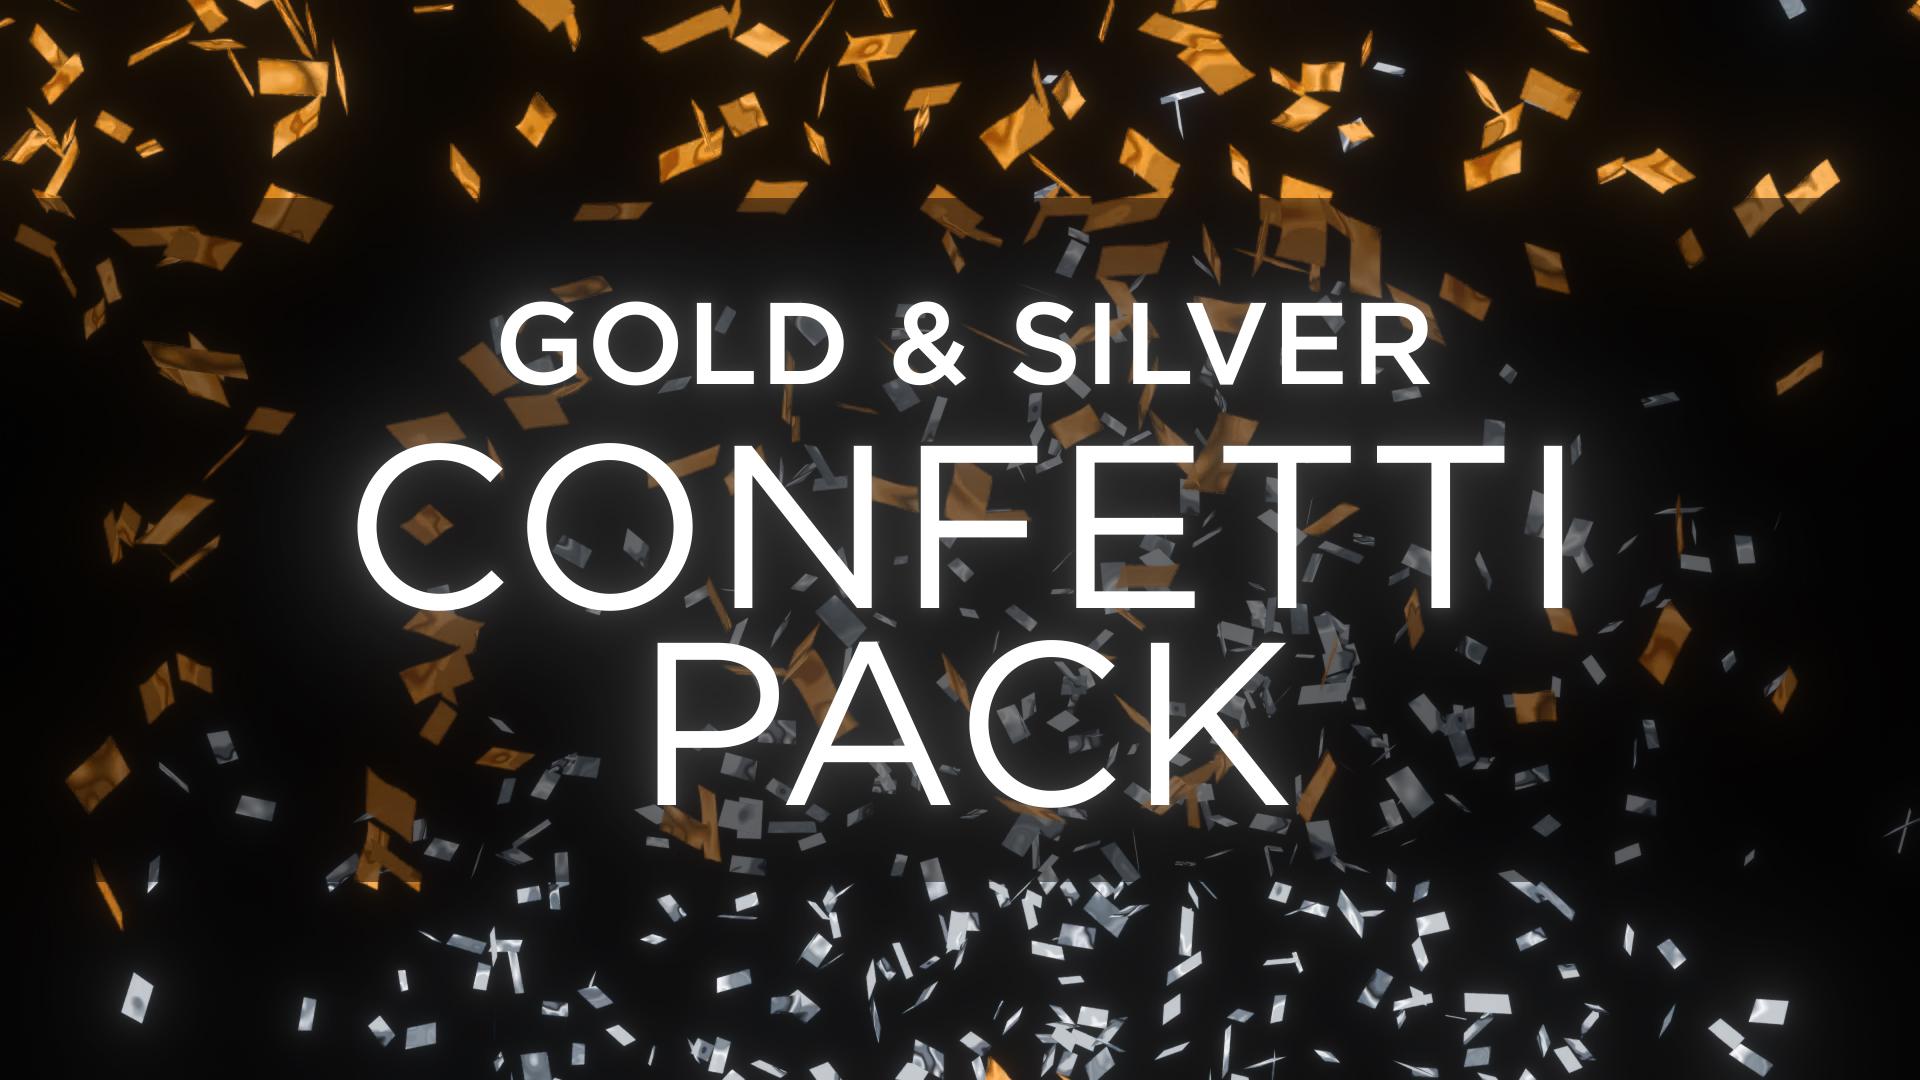 Gold Confetti Overlay Pack 4K Stock Footage Still HD